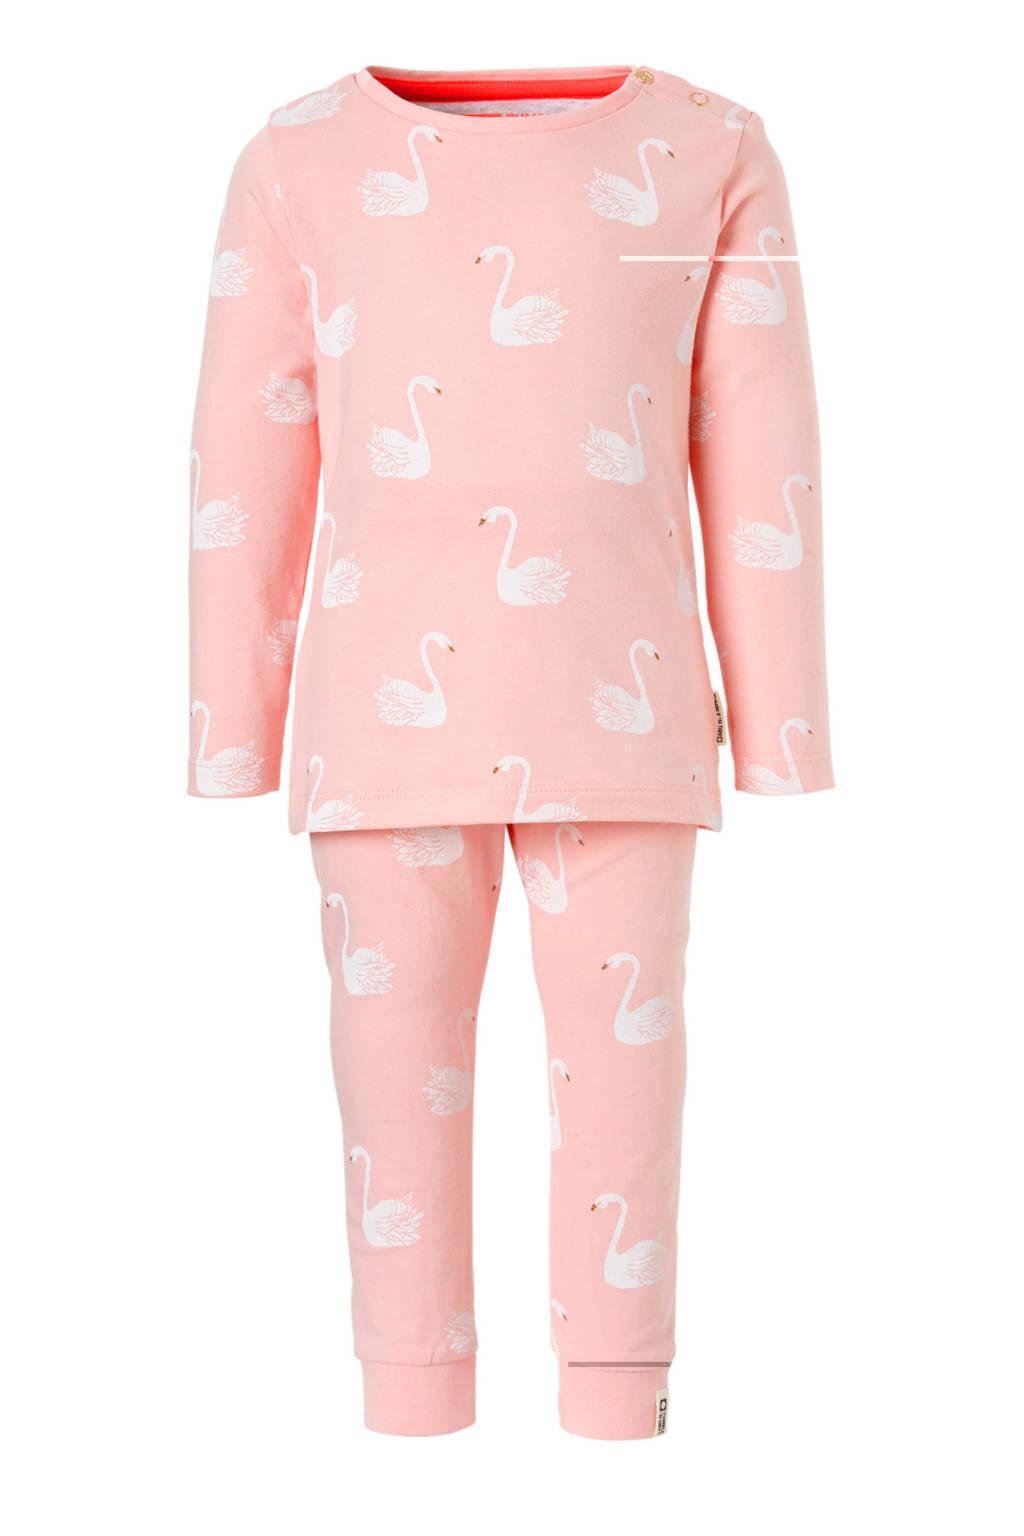 Tumble 'n Dry Lo pyjama Teri met zwanen roze, Roze/wit